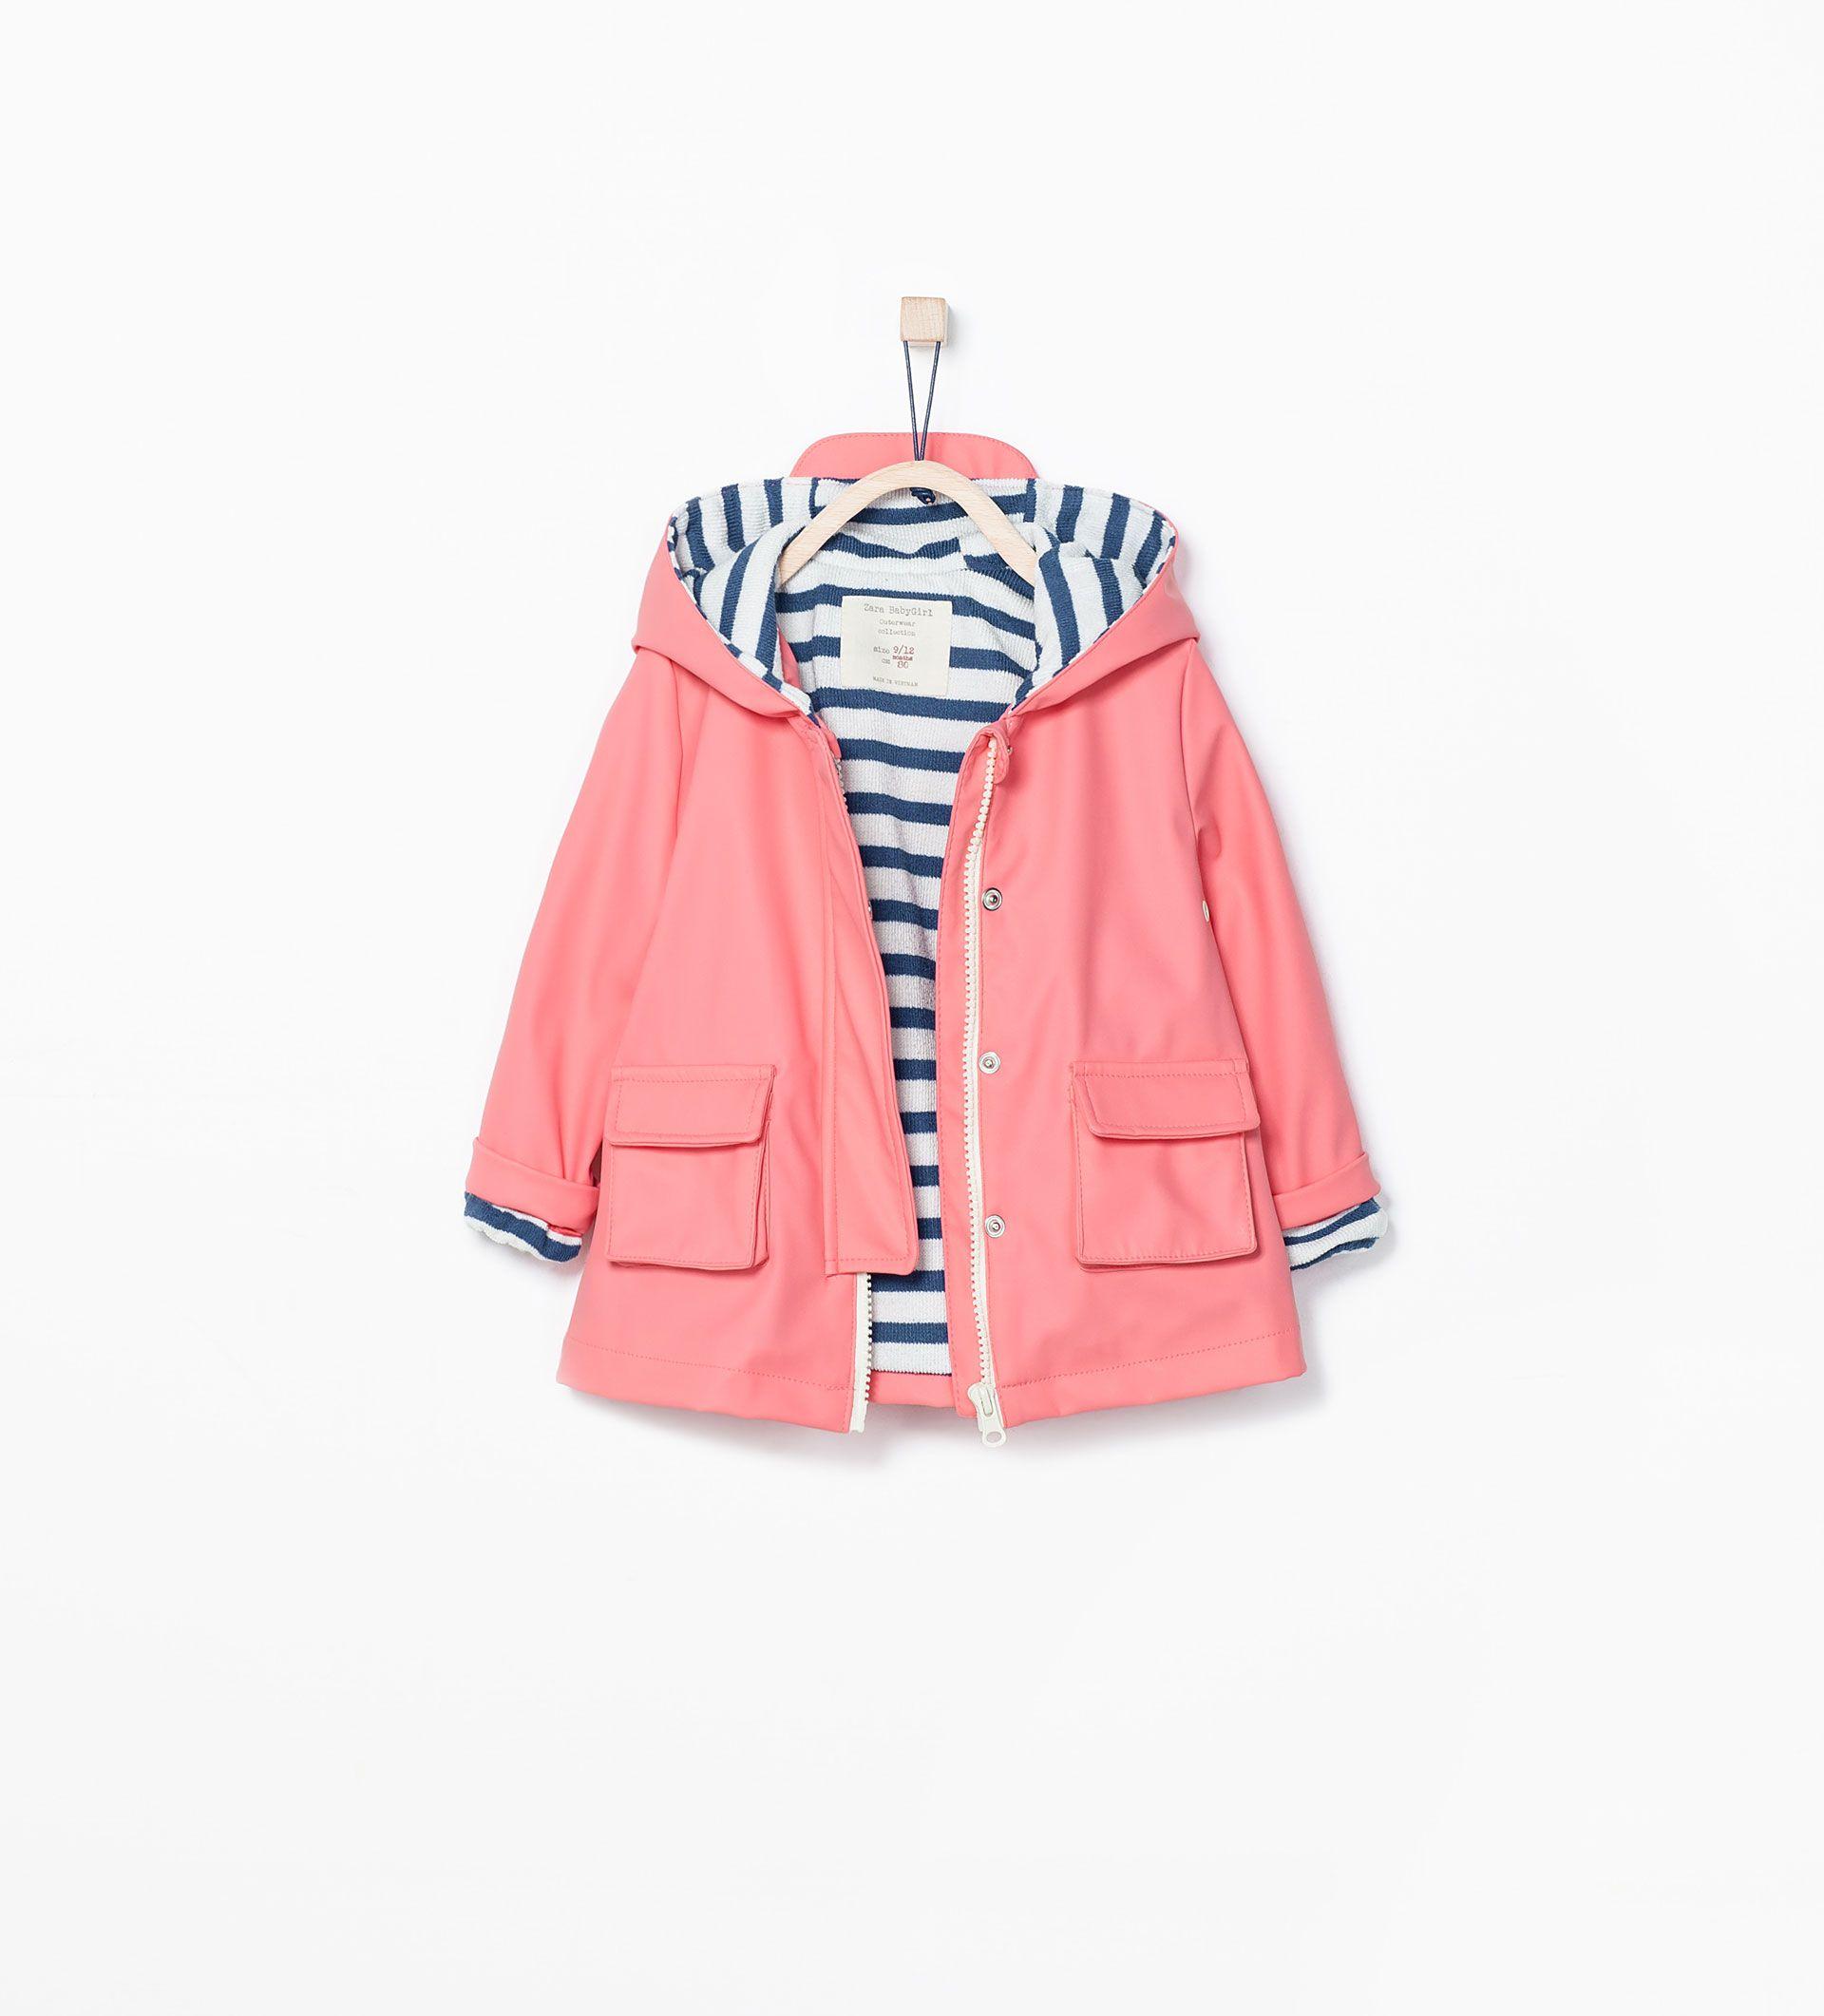 Striped Ideas Raincoat Ame With Kids Lining Zara Fashion qan0tUP